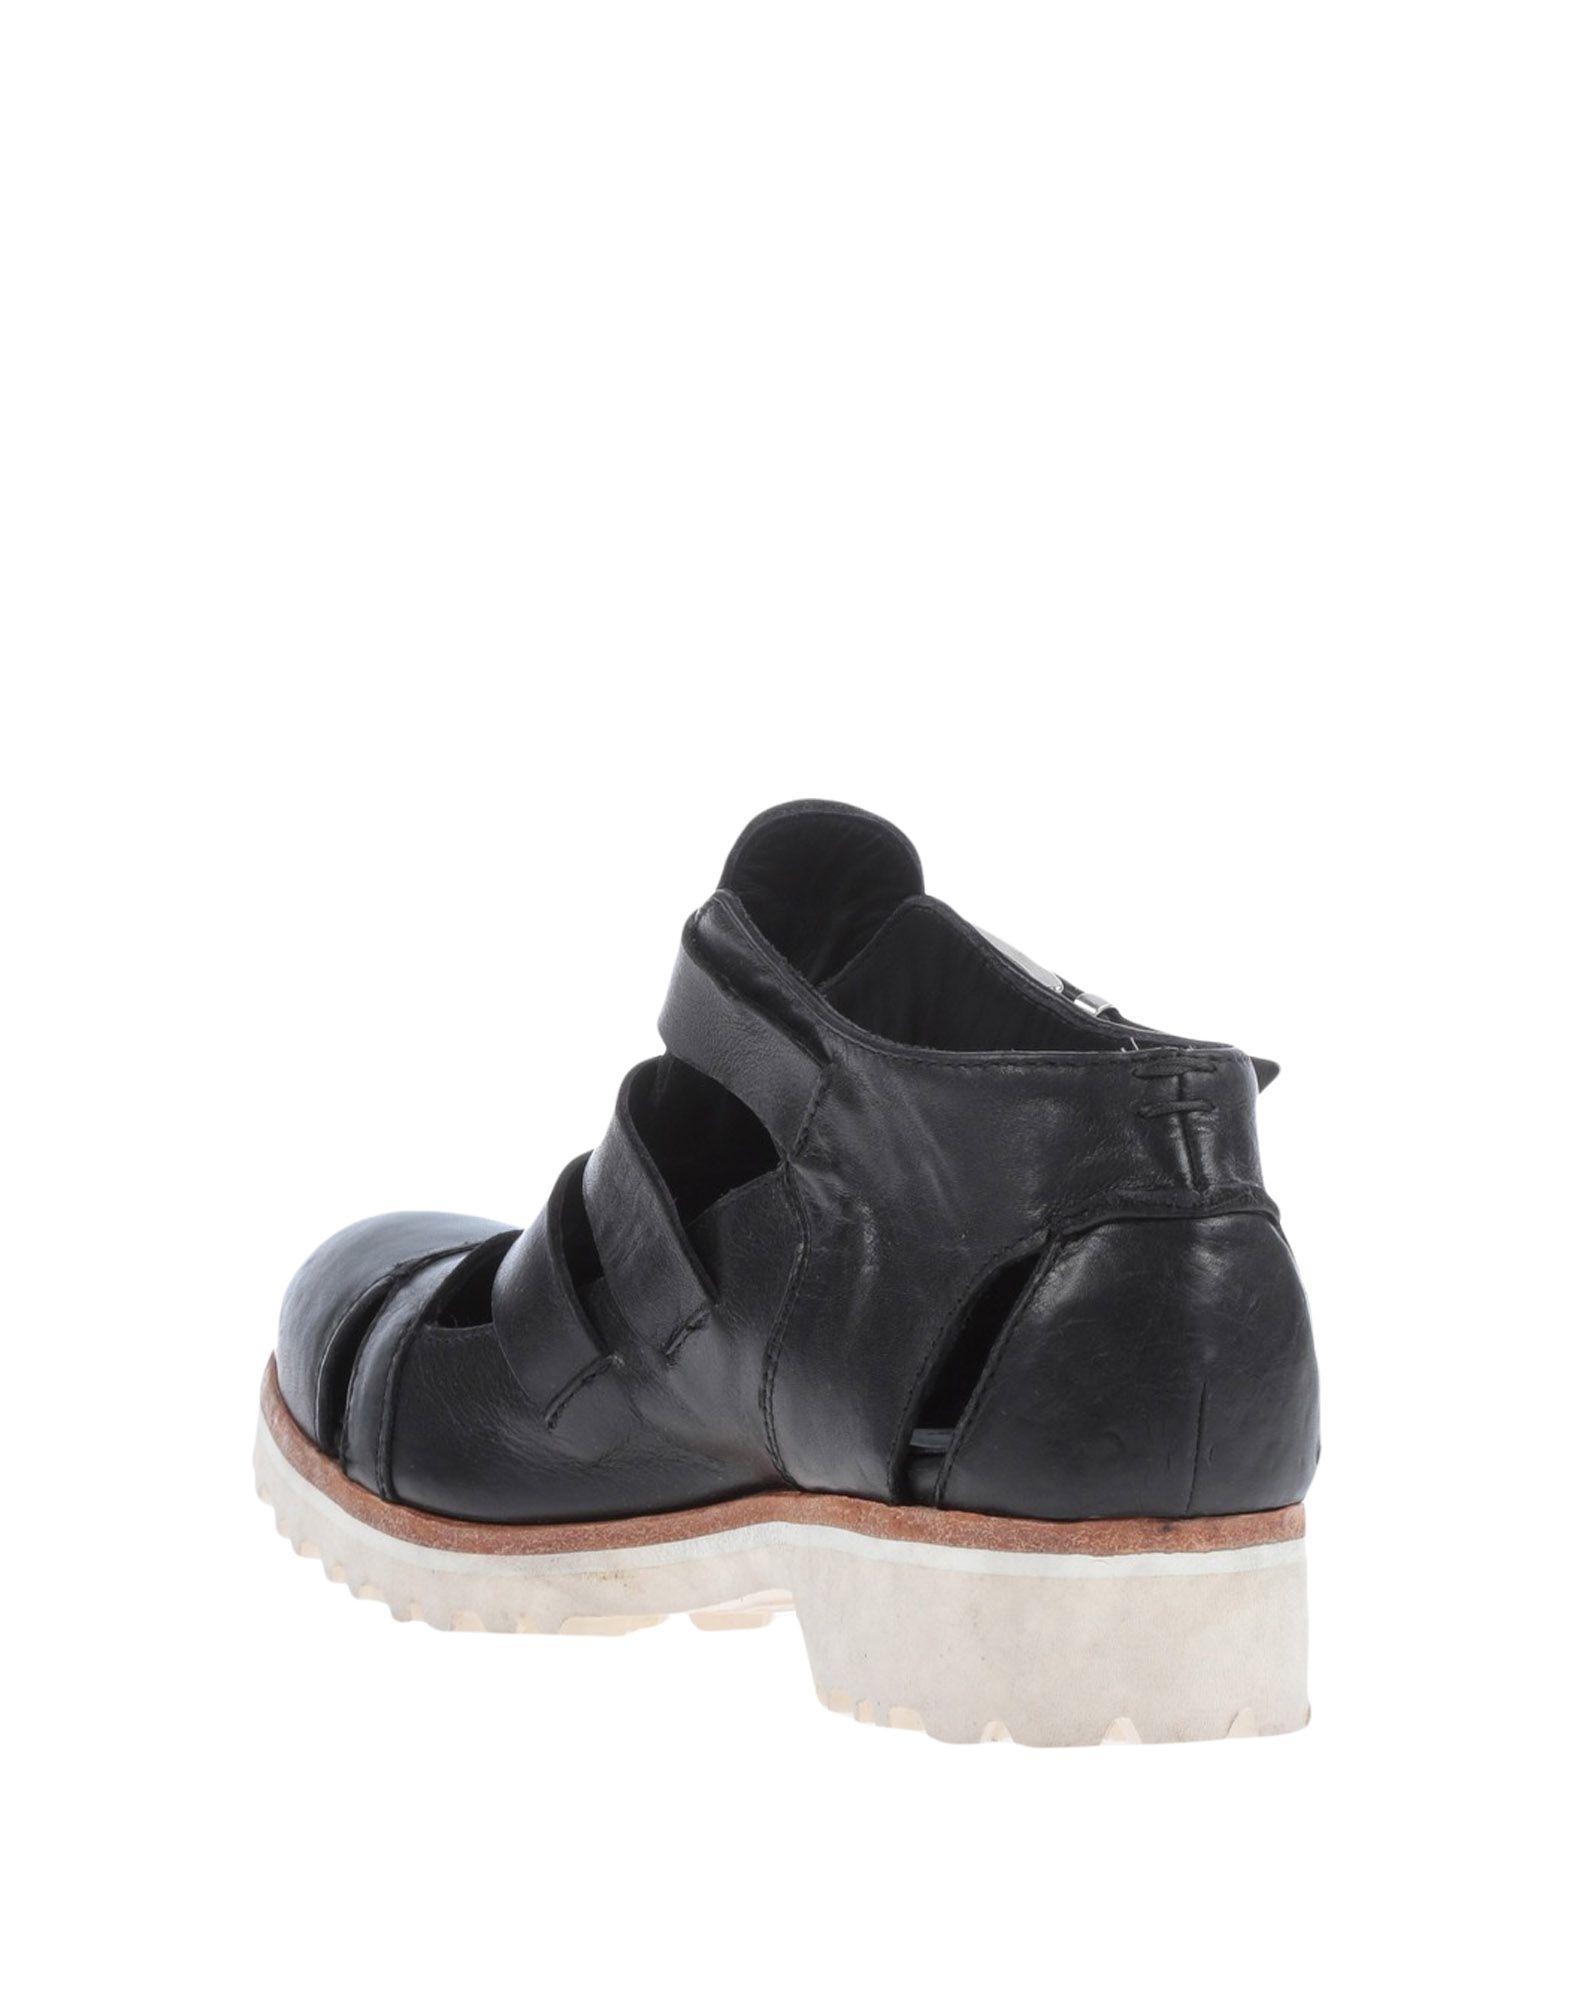 Stilvolle billige Schuhe Damen Open Closed  Shoes Sandalen Damen Schuhe  11514557VB b1c807